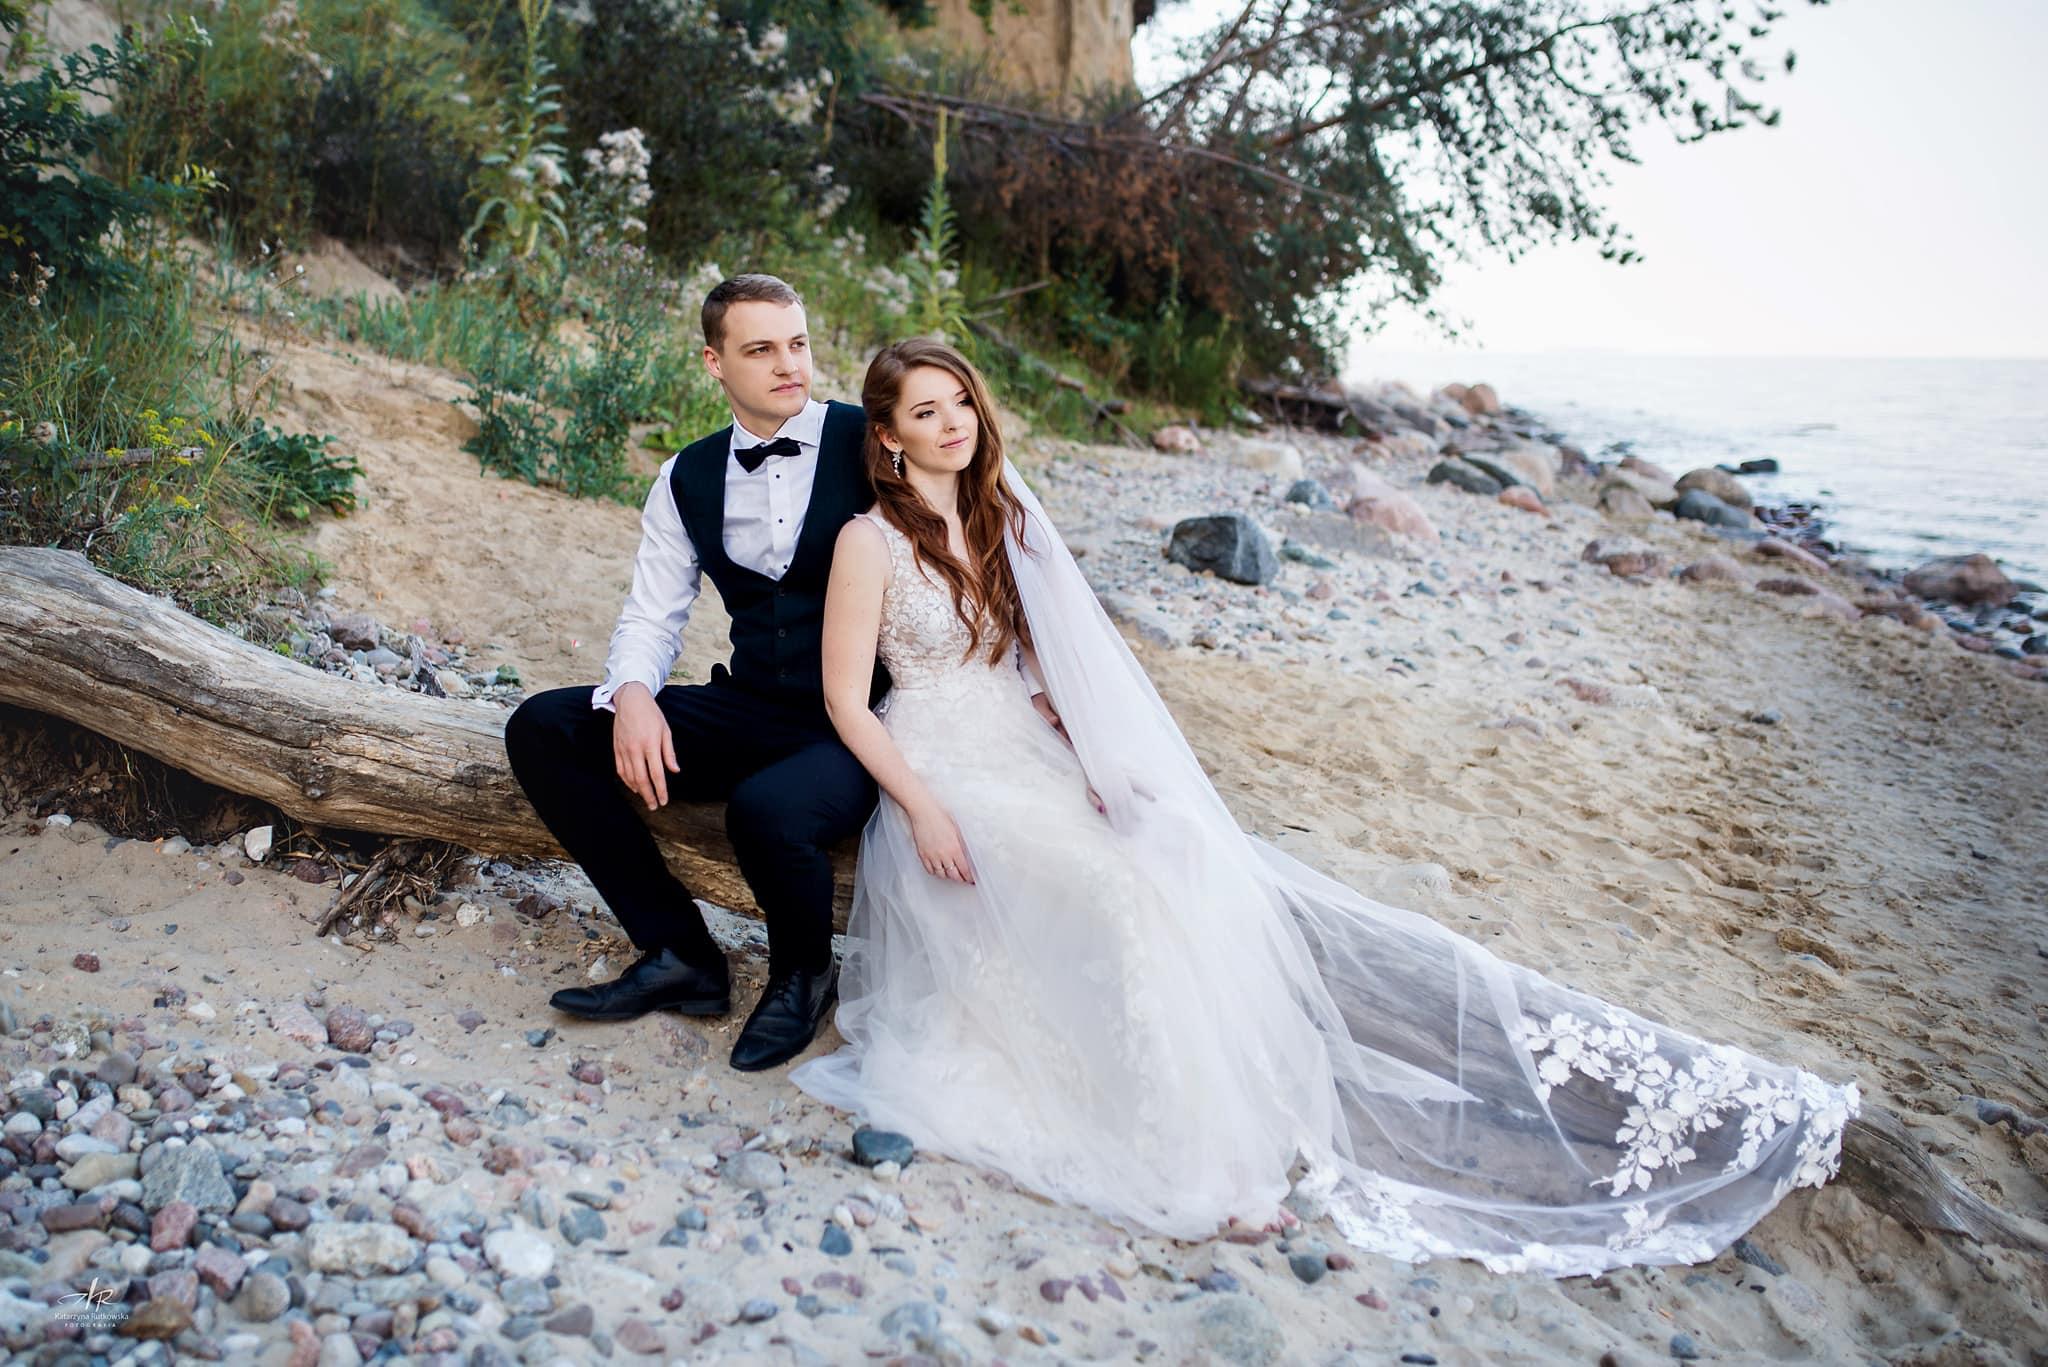 Sesja ślubna - Plener - Nad Morzem